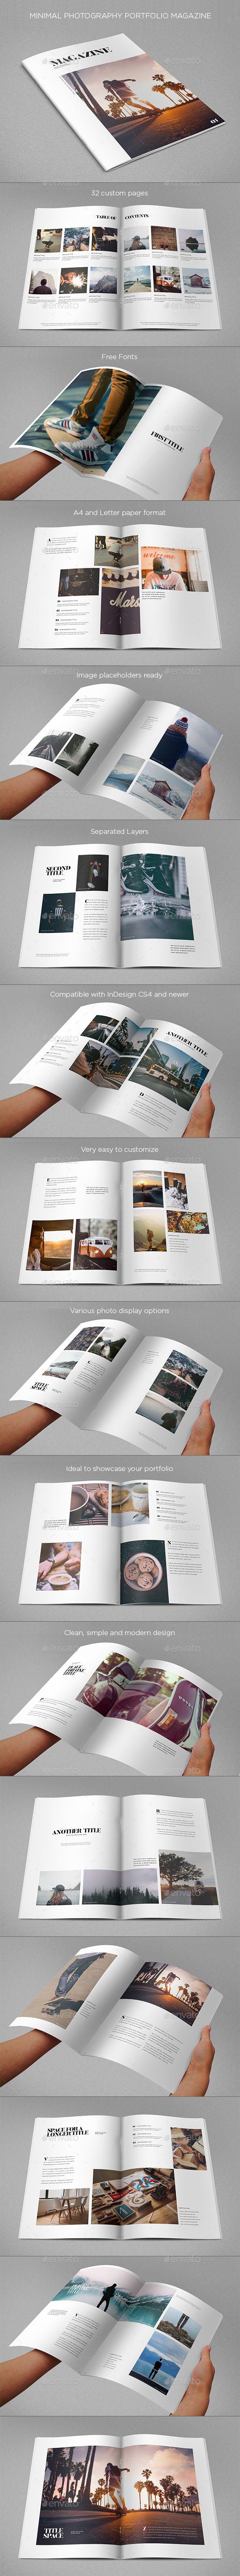 Minimal Photography Portfolio Magazine Template InDesign INDD. Download here: https://graphicriver.net/item/minimal-photography-portfolio-magazine/16987998?ref=ksioks